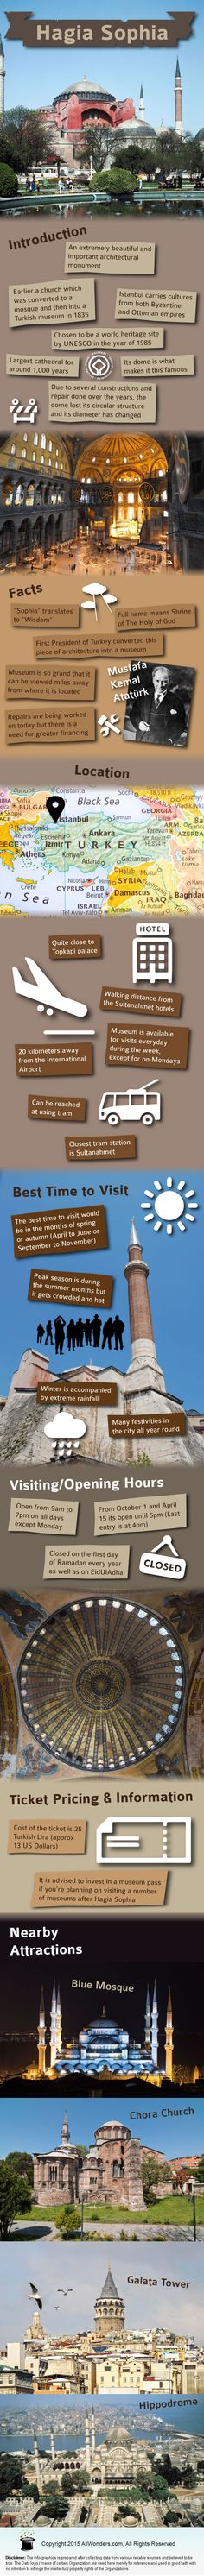 Hagia Sophia Infographic - Gather information about Hagia Sophia through this infographic.